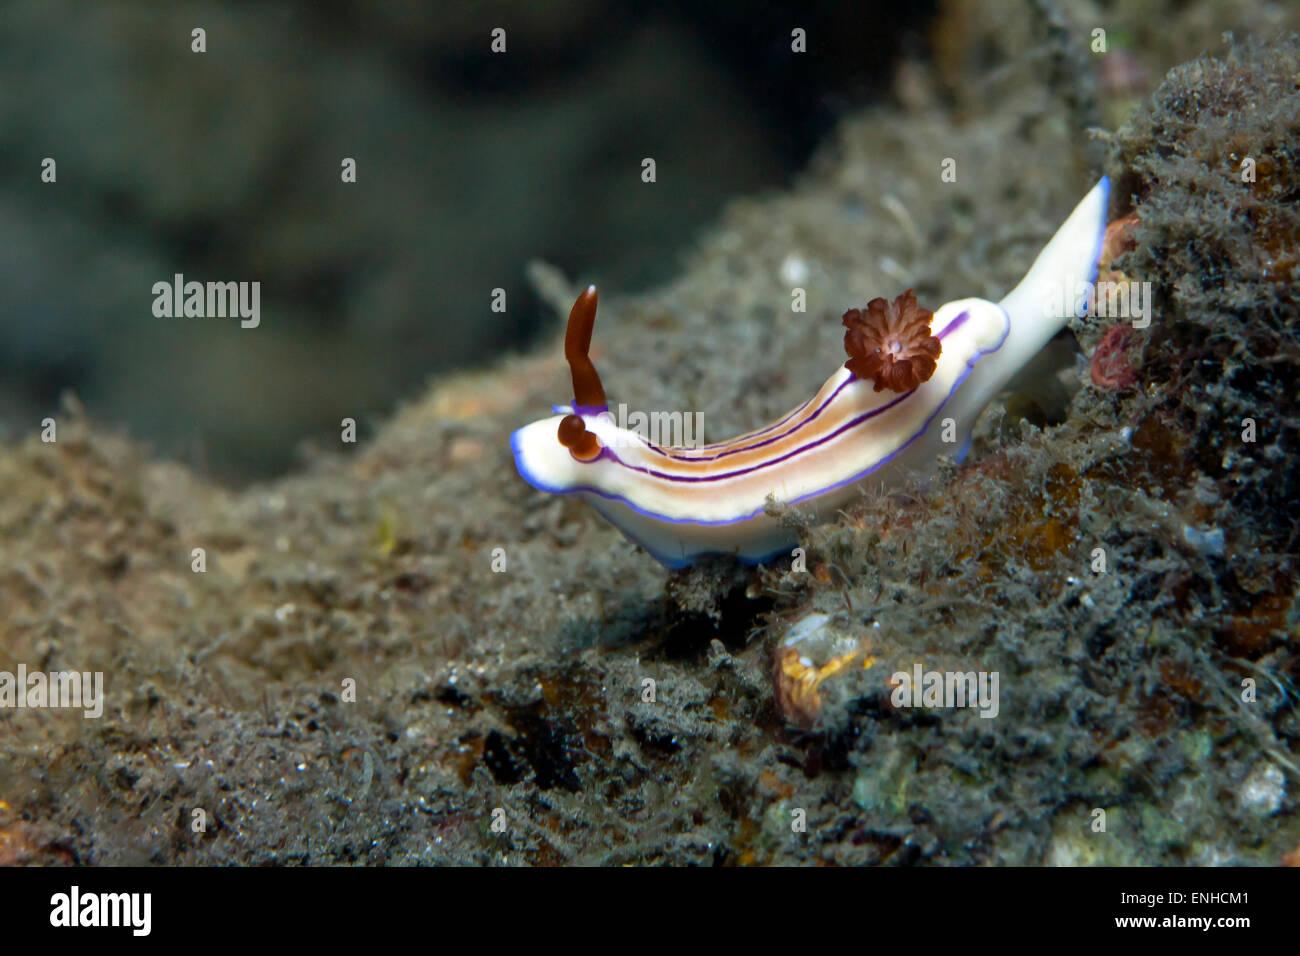 Magenta-striped nudibranch (Hypselodoris maridadilus), Bali, Indonesia - Stock Image